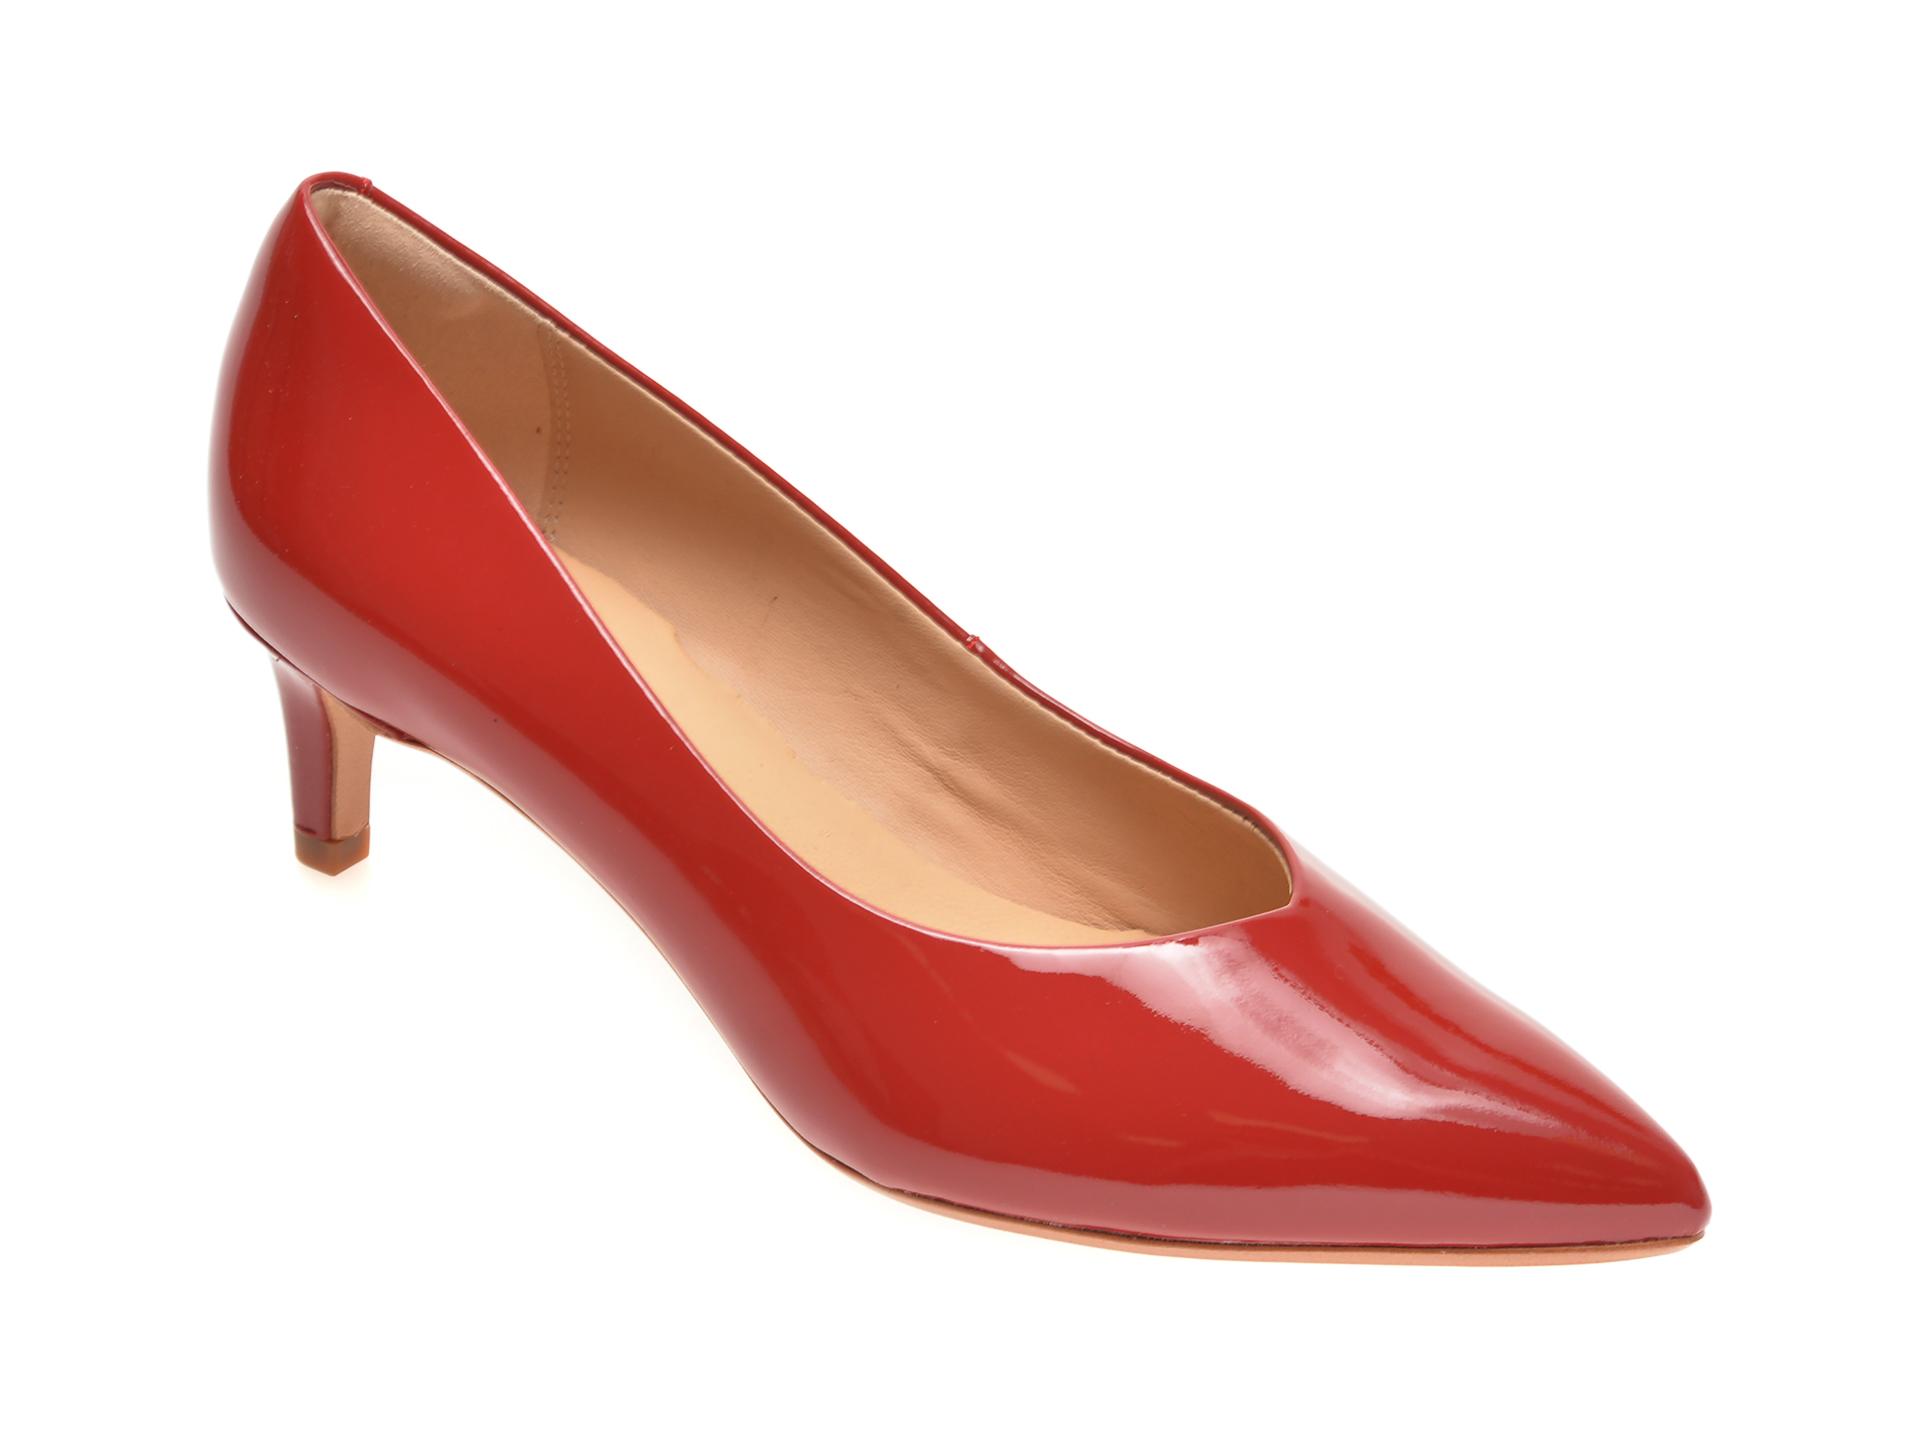 Pantofi CLARKS rosii, LAI55C2, din piele naturala